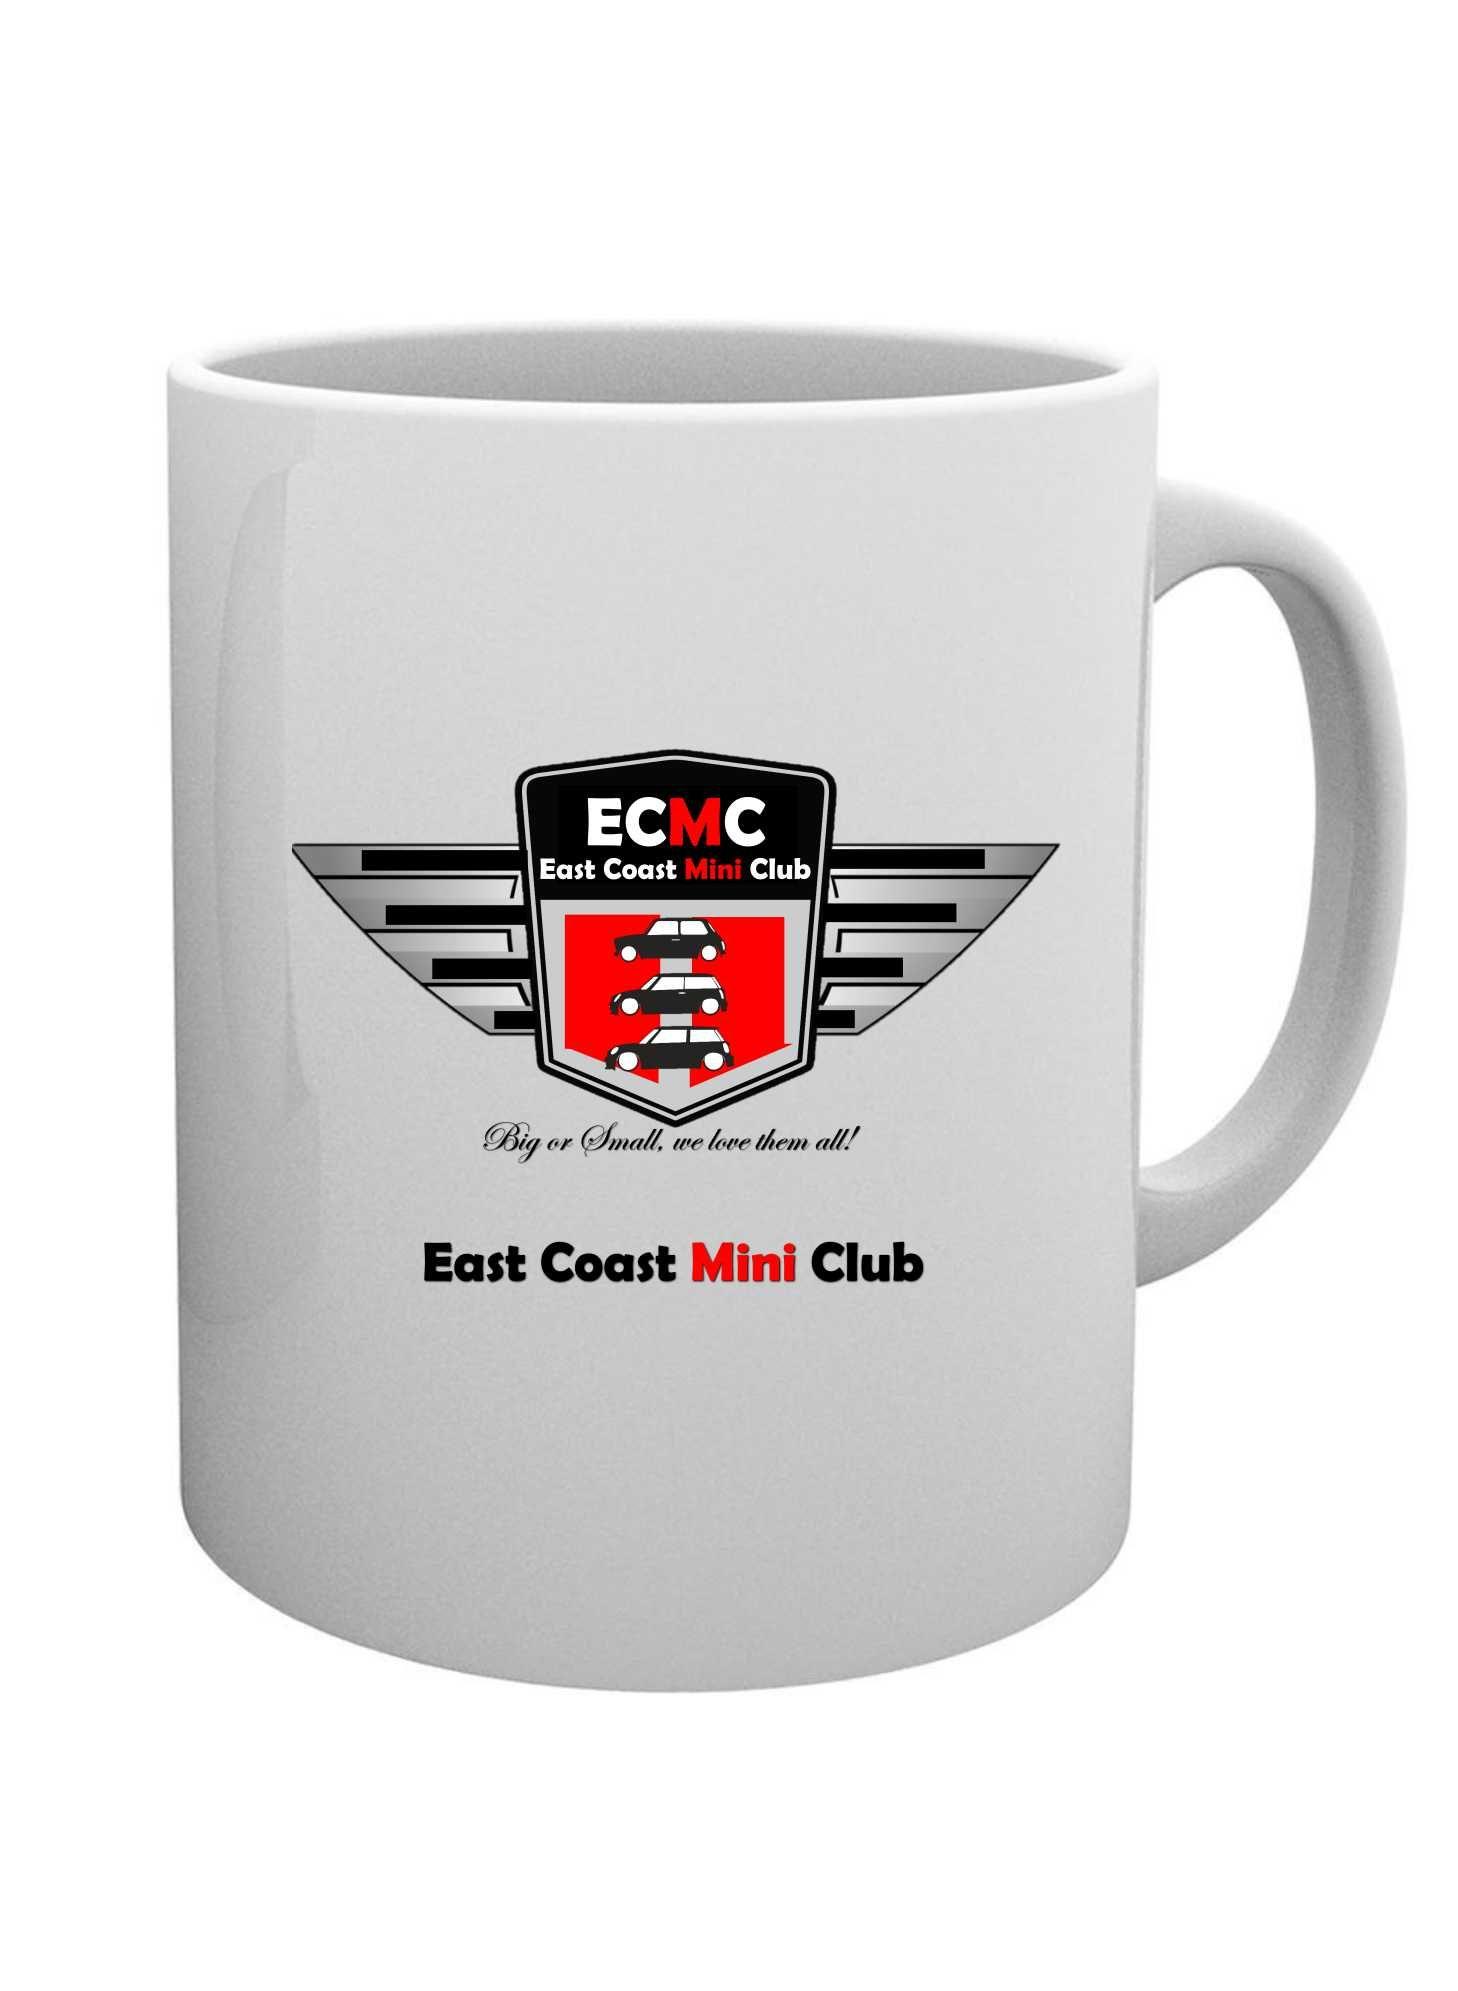 East Coast Mini Club – Mug